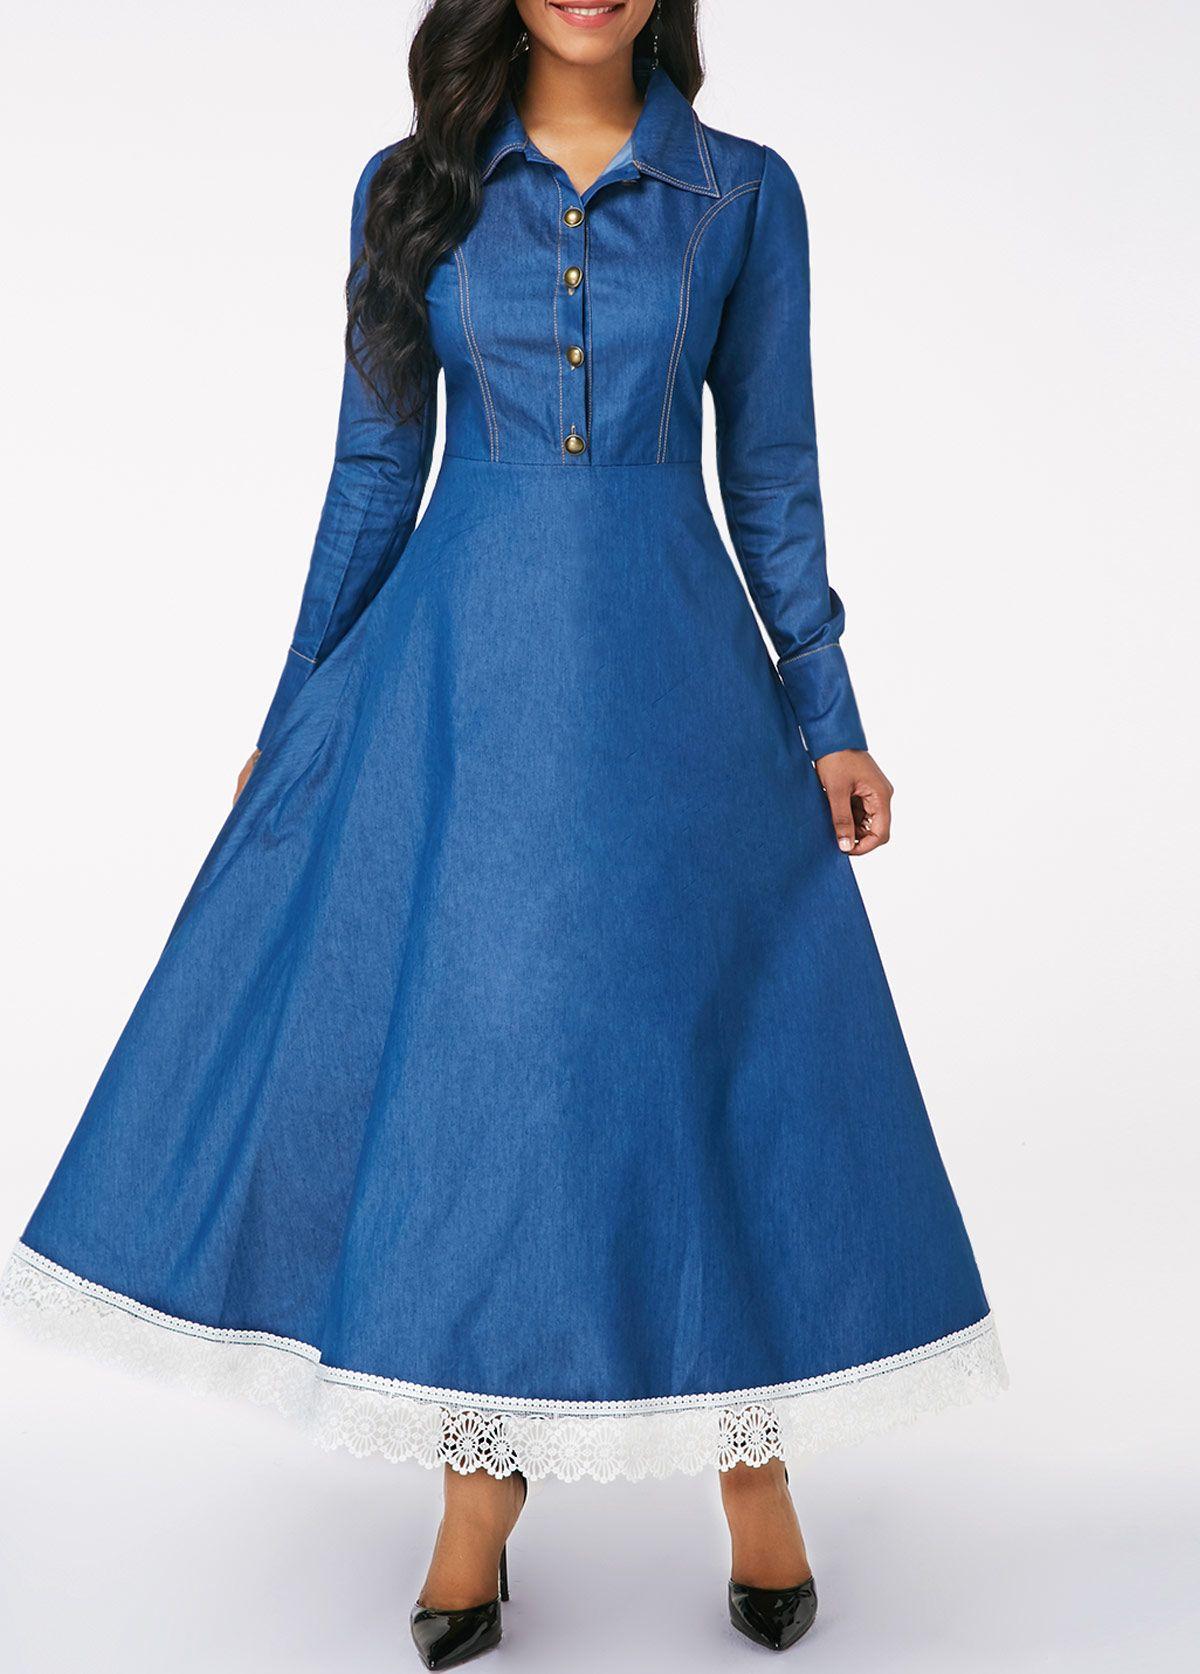 Long sleeve button front lace patchwork denim dress fallwinter